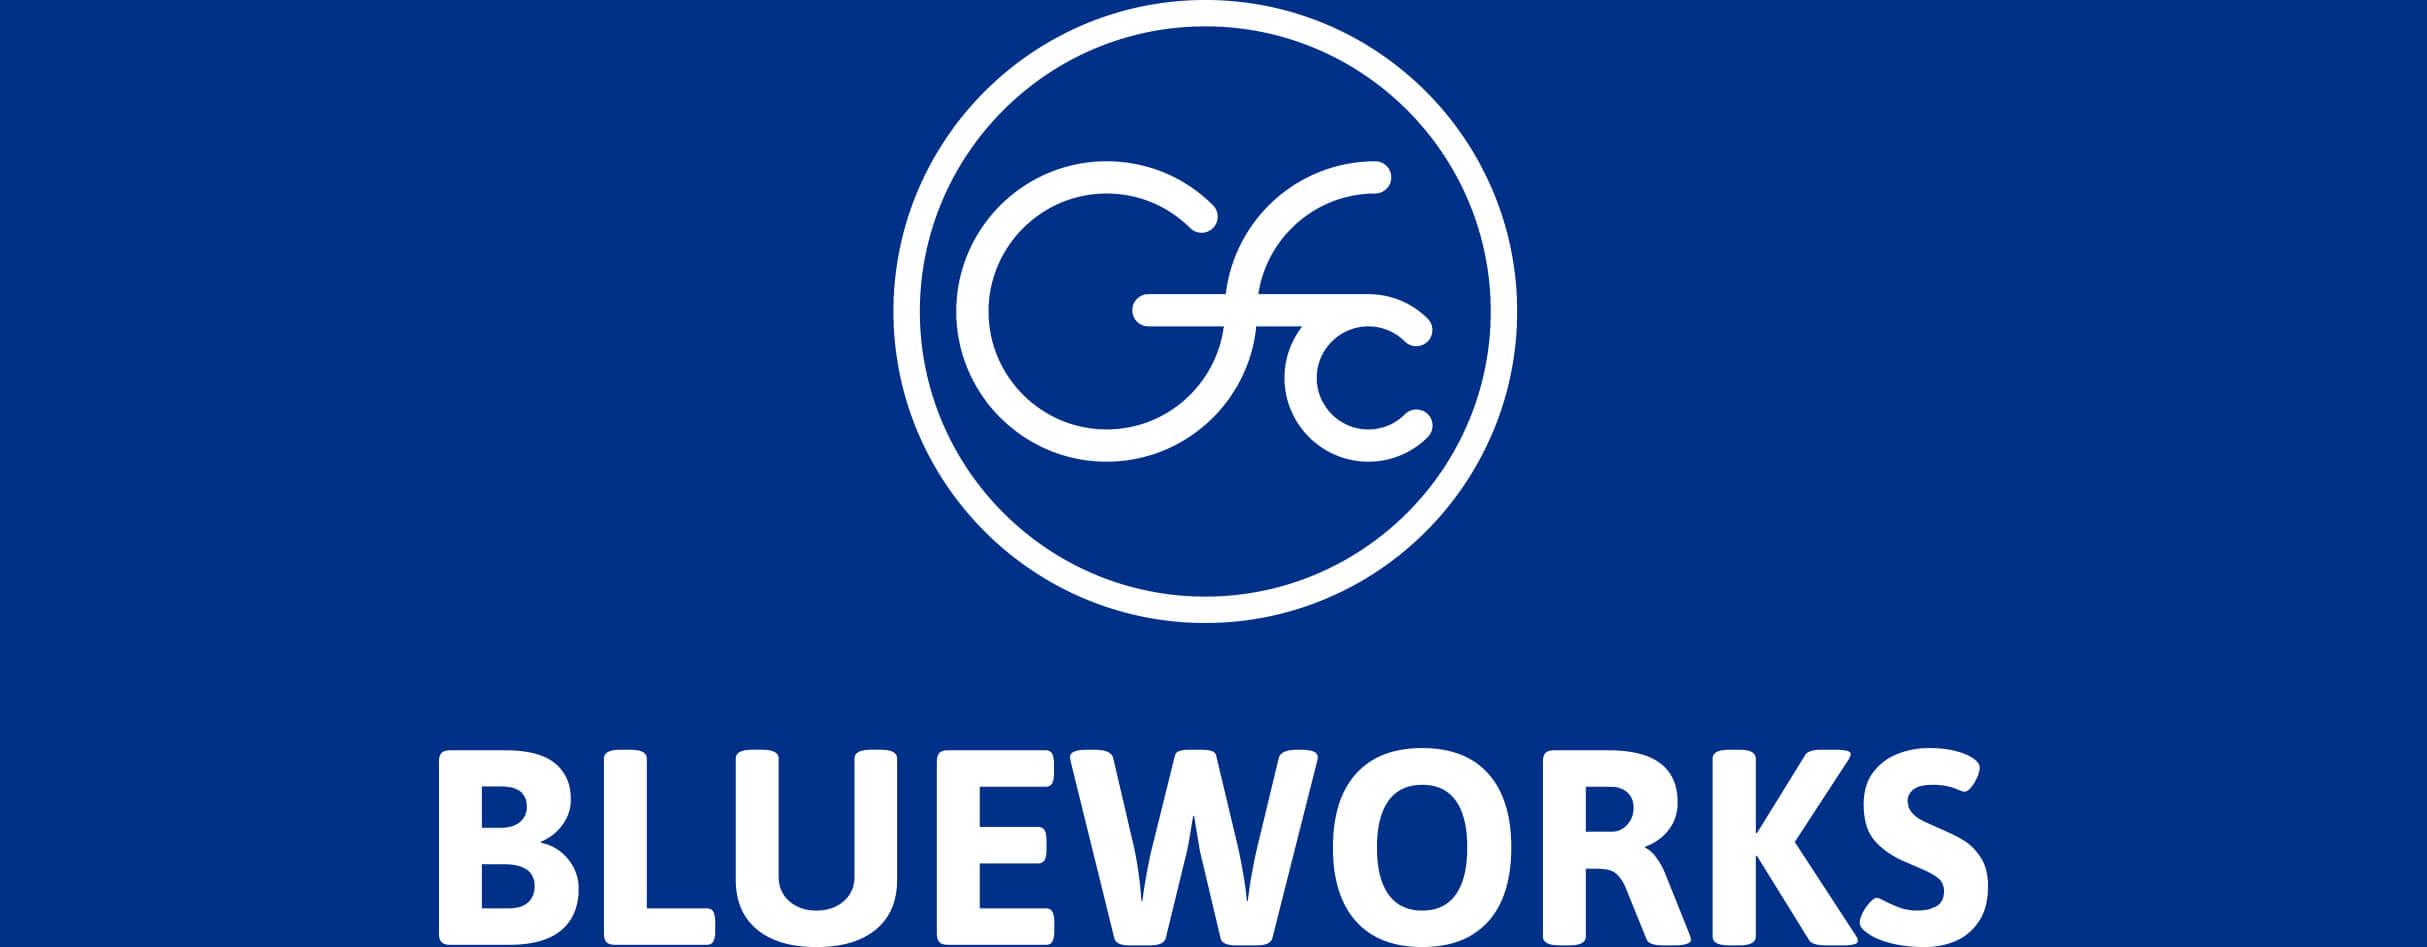 Blueworks GmbH